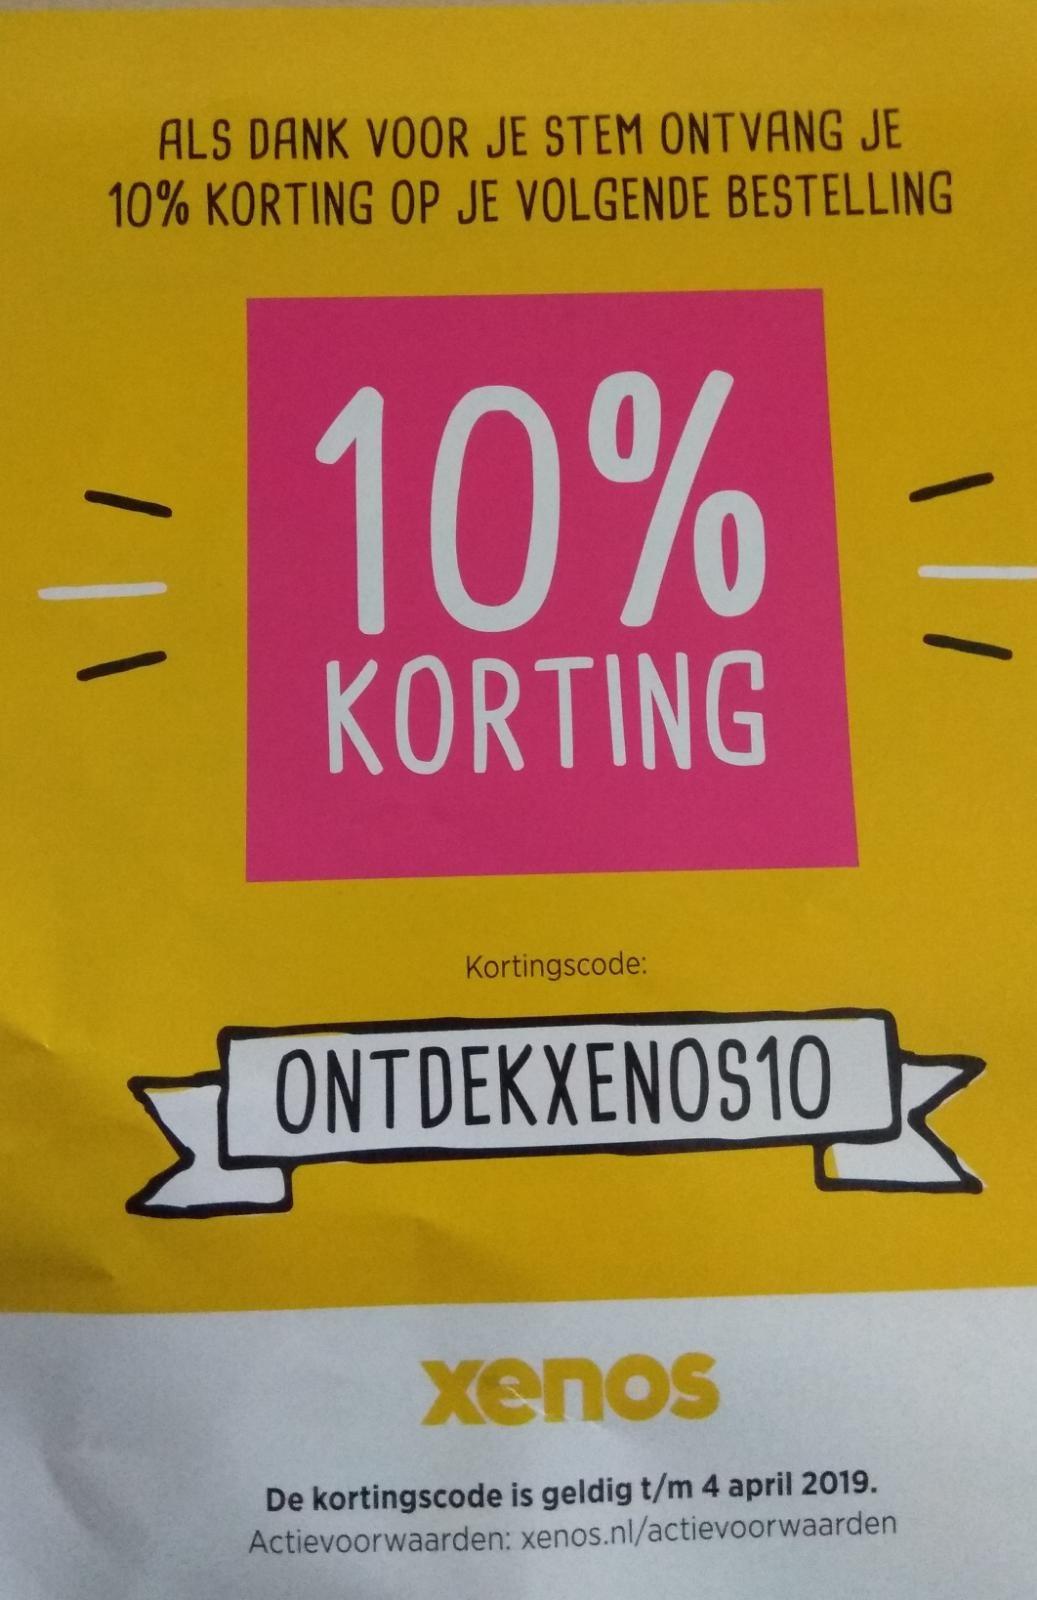 10% korting bij Xenos